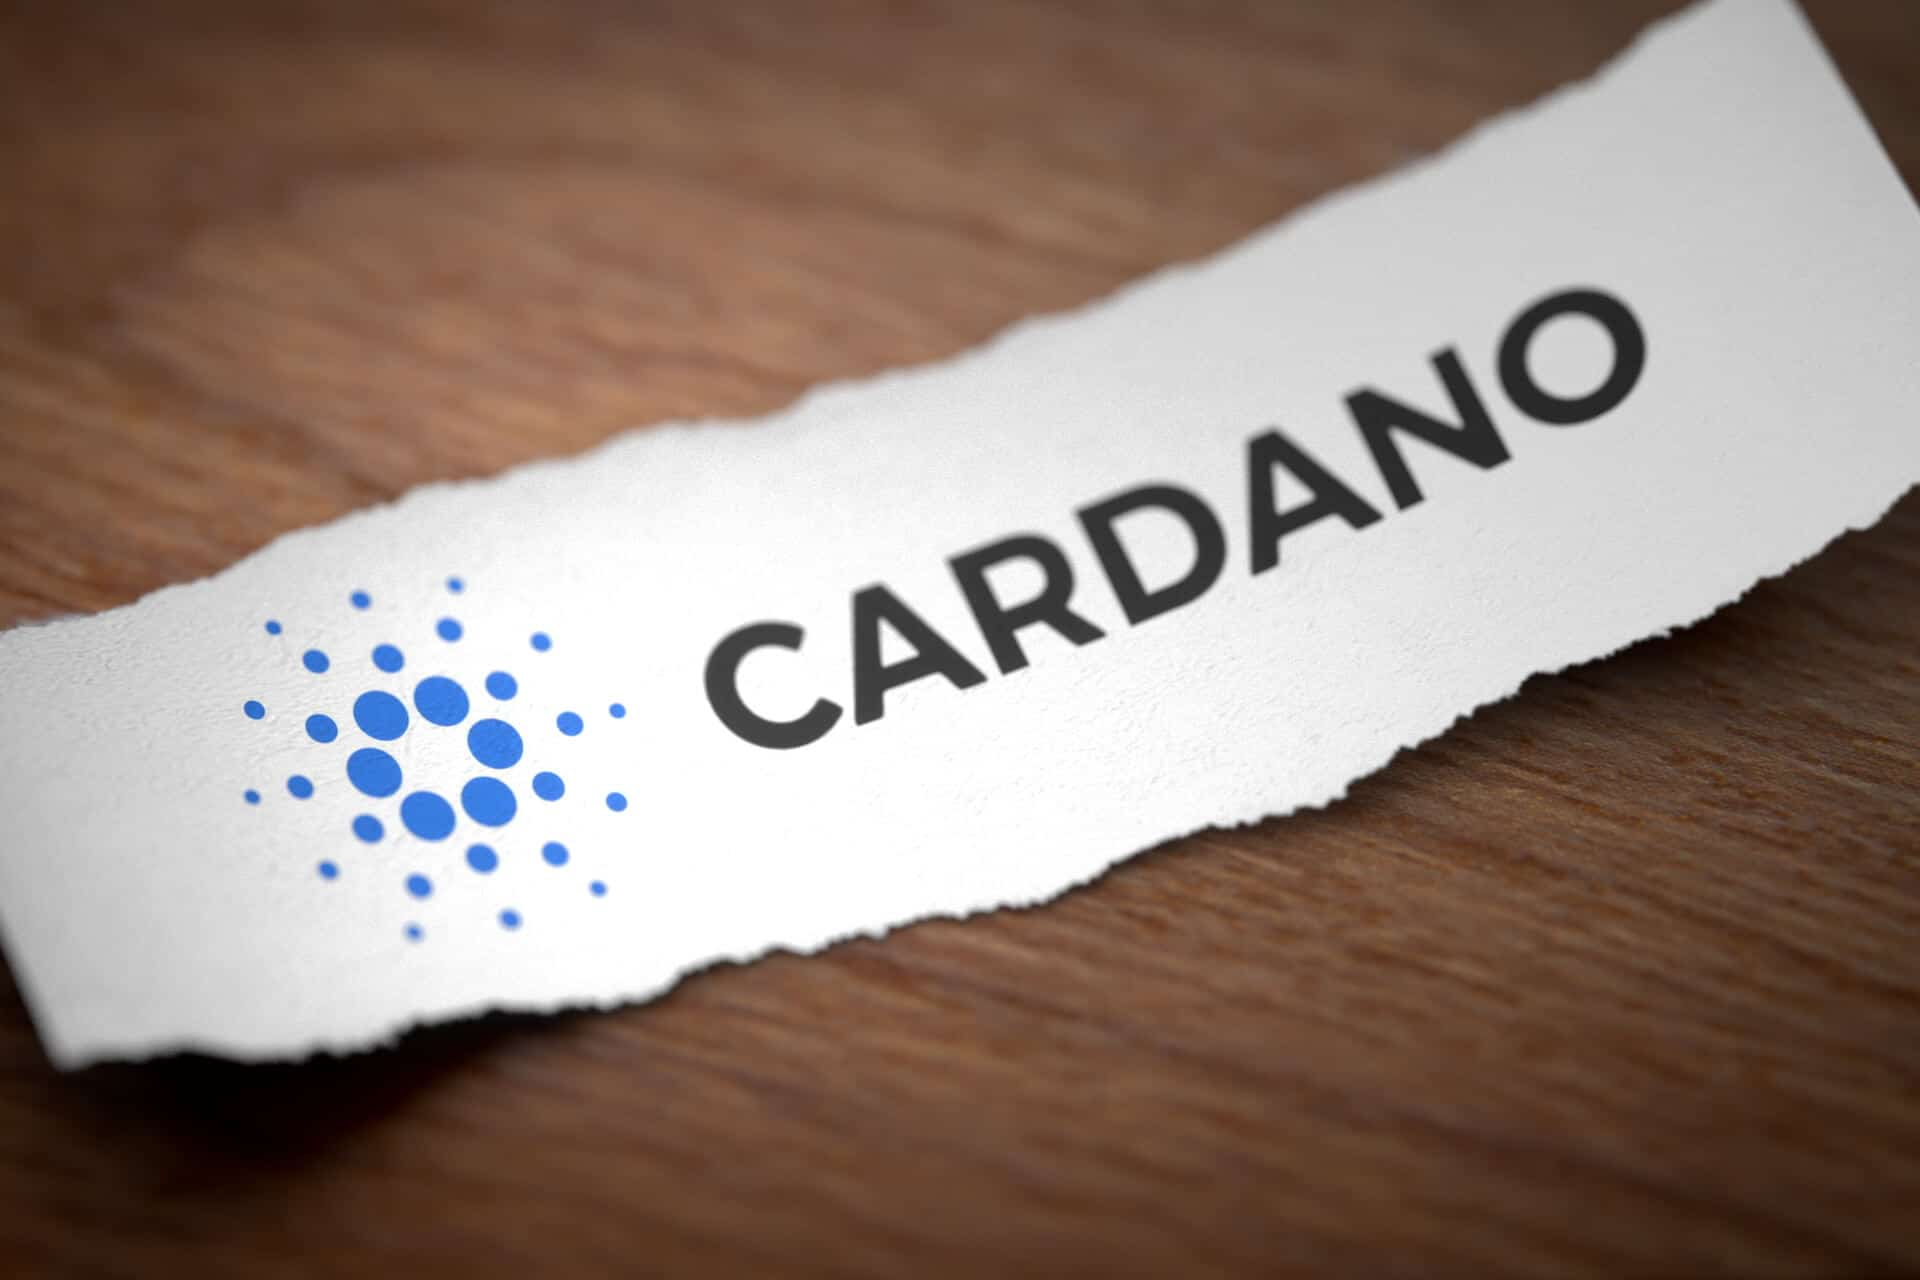 cardano torn paper wo